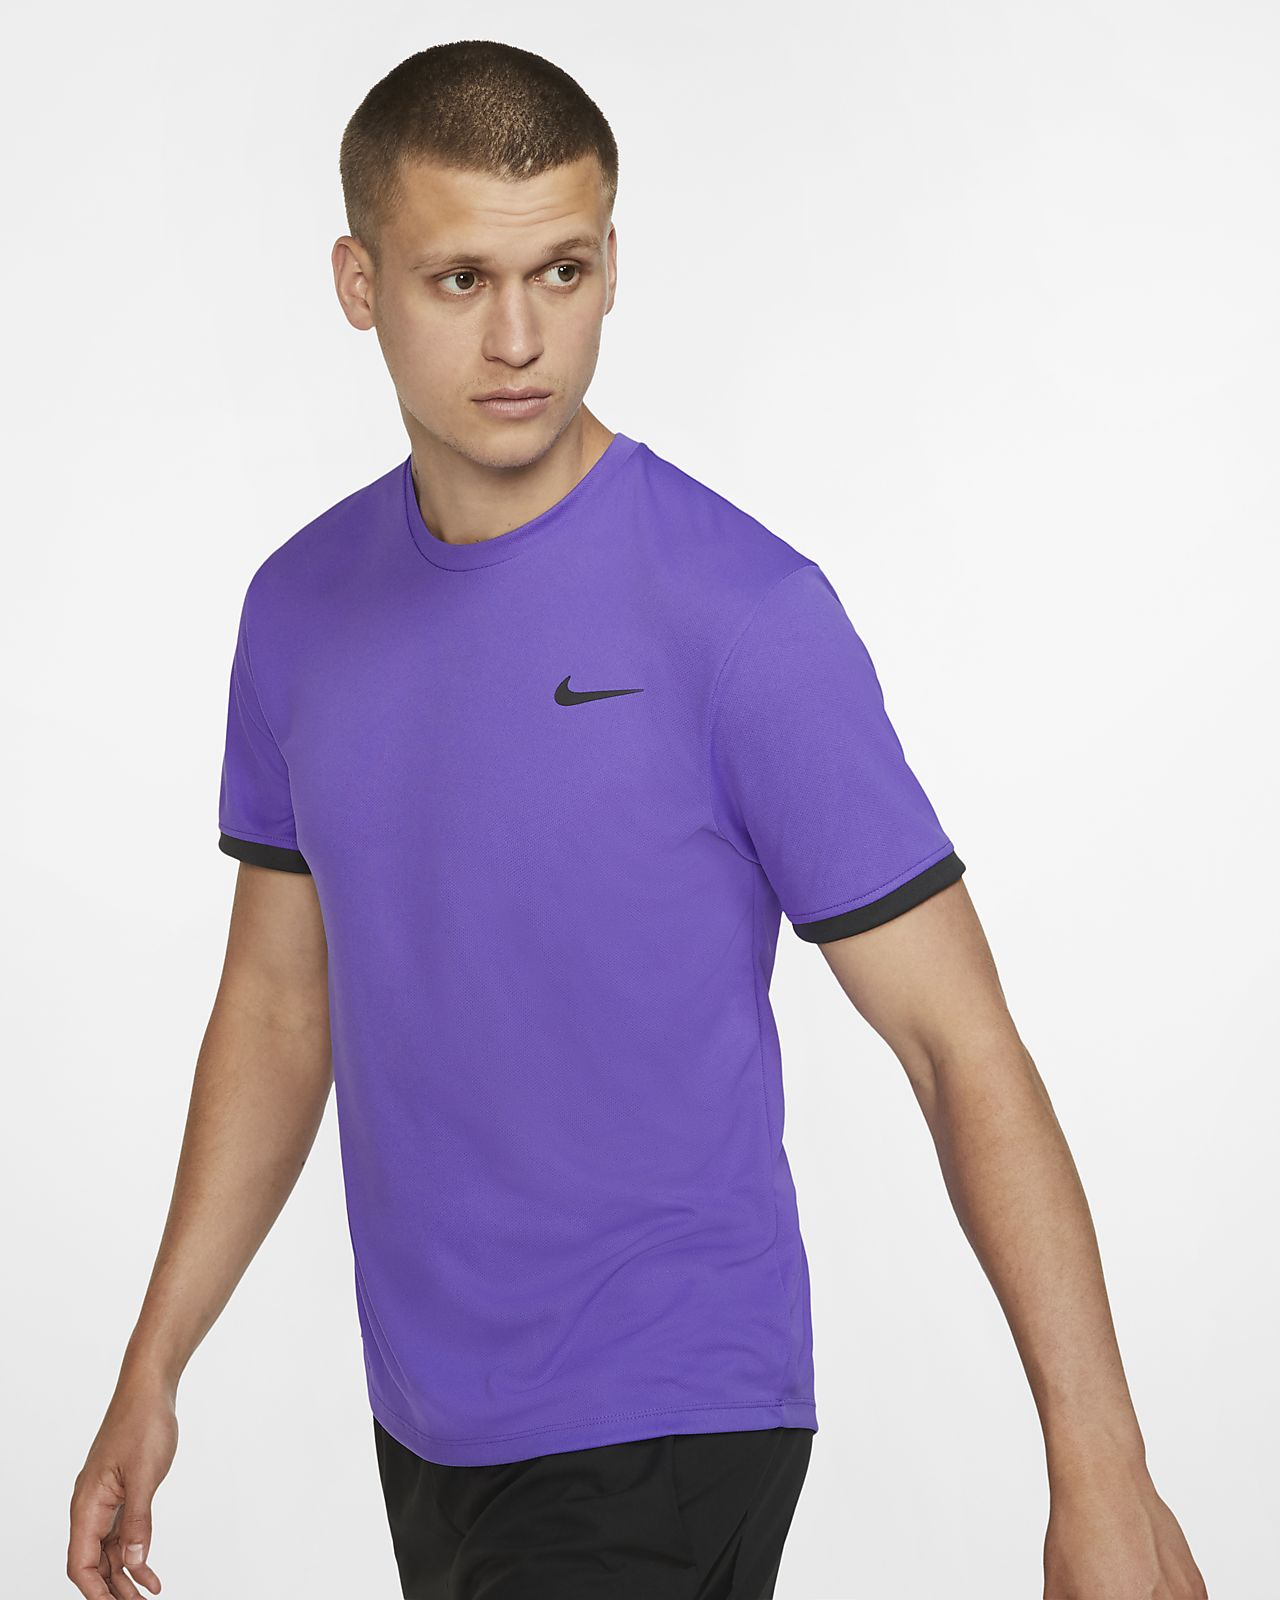 Kortärmad tenniströja NikeCourt Dri-FIT för män